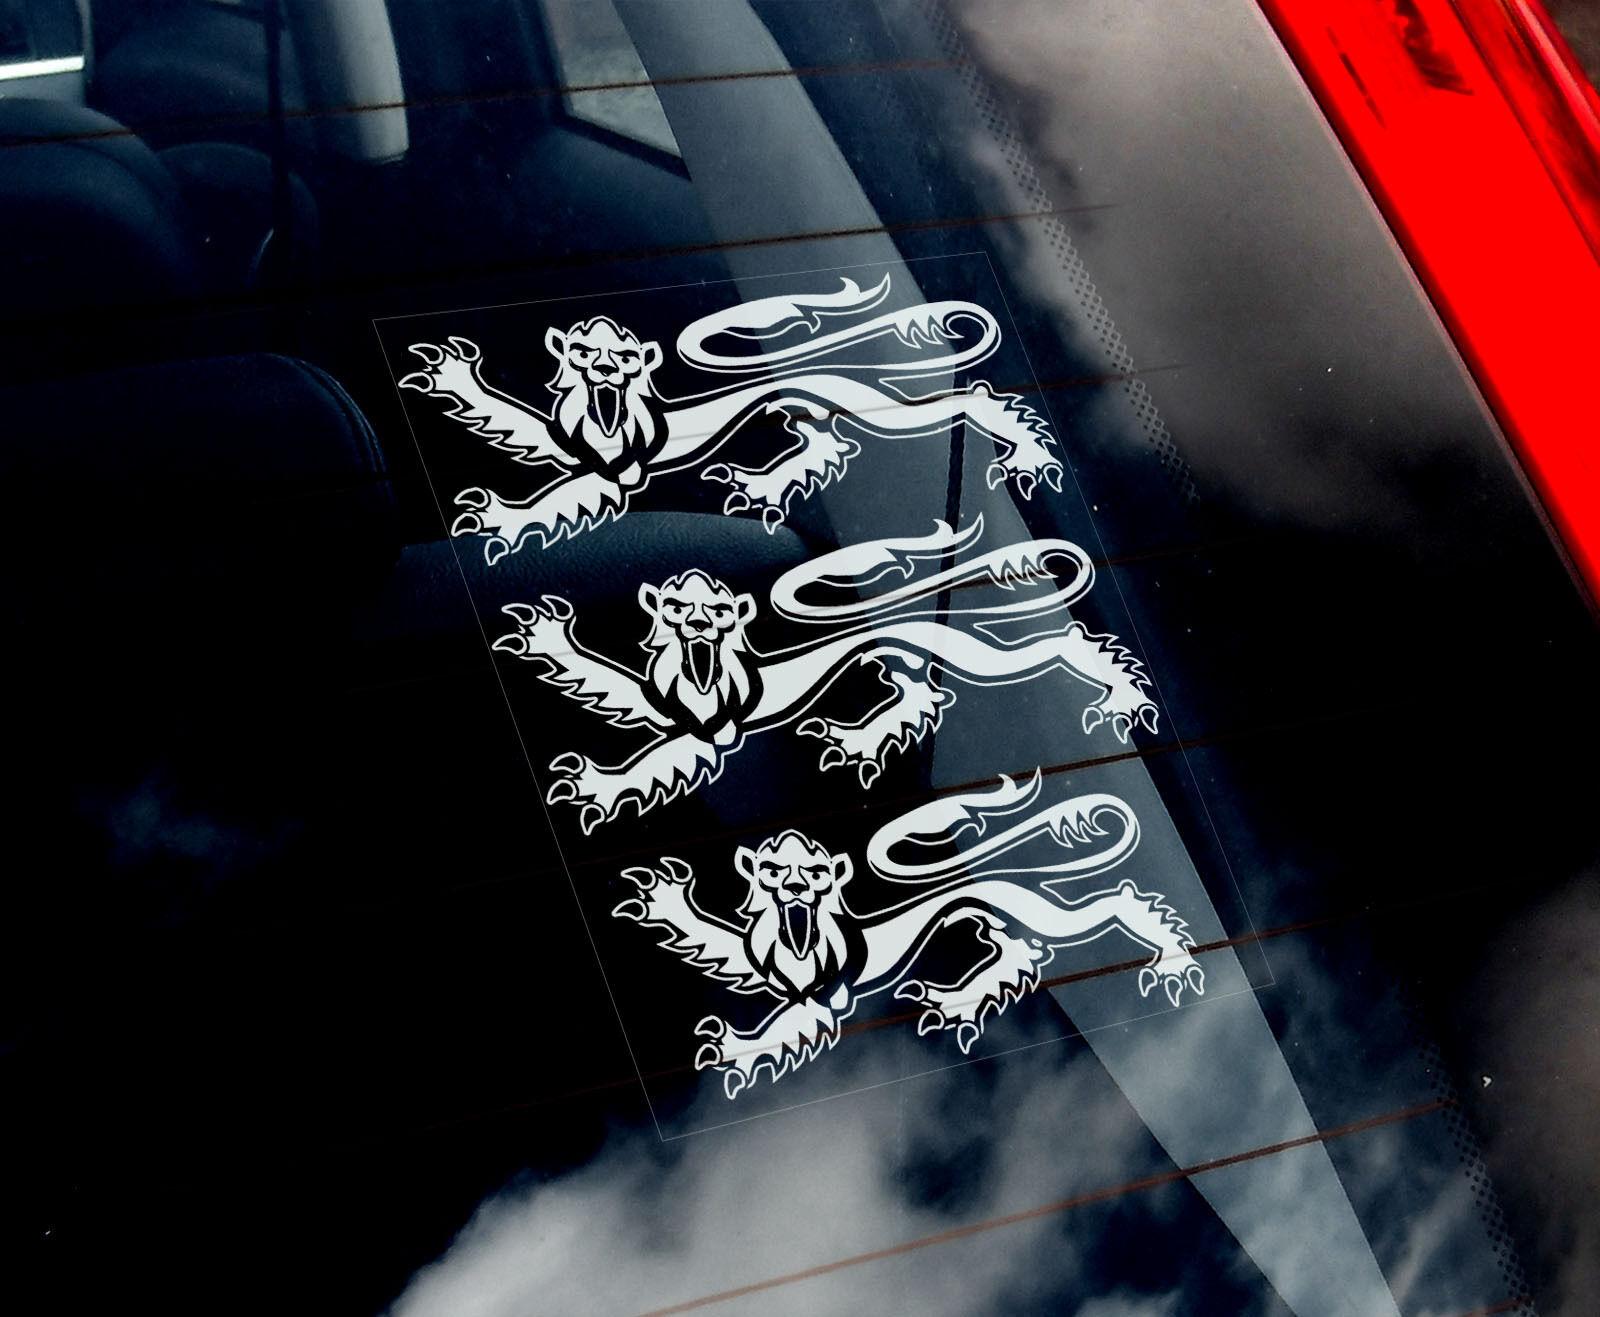 Trois Lions-Voiture Fenêtre Autocollant-Angleterre Royal 3 armoiries football Signe